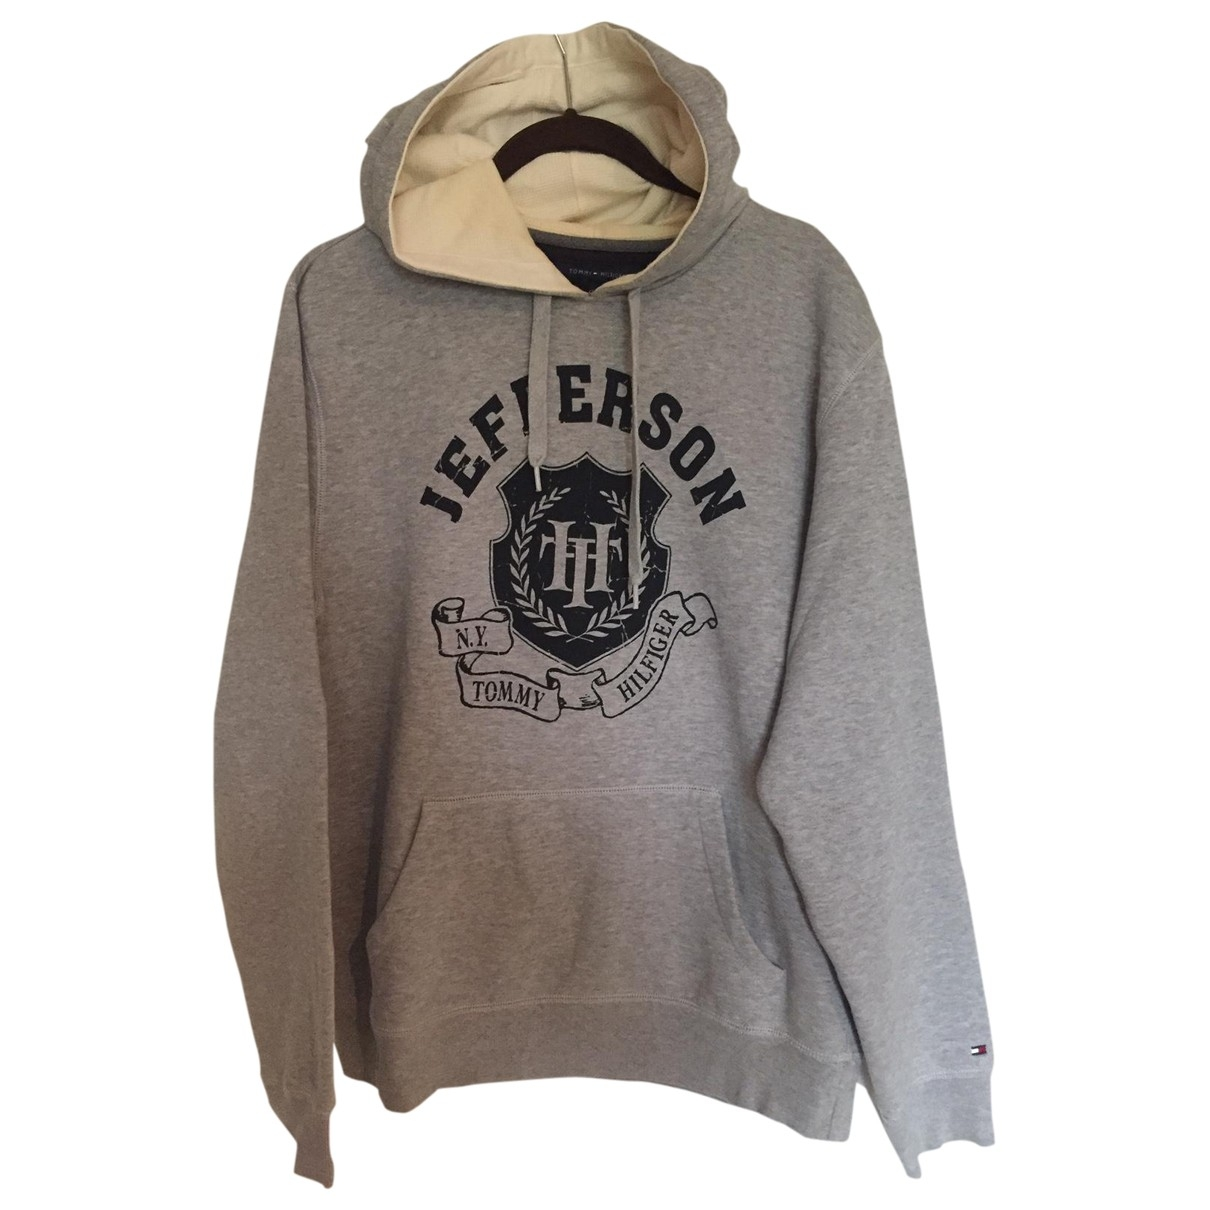 Tommy Hilfiger \N Grey Cotton Knitwear & Sweatshirts for Men M International